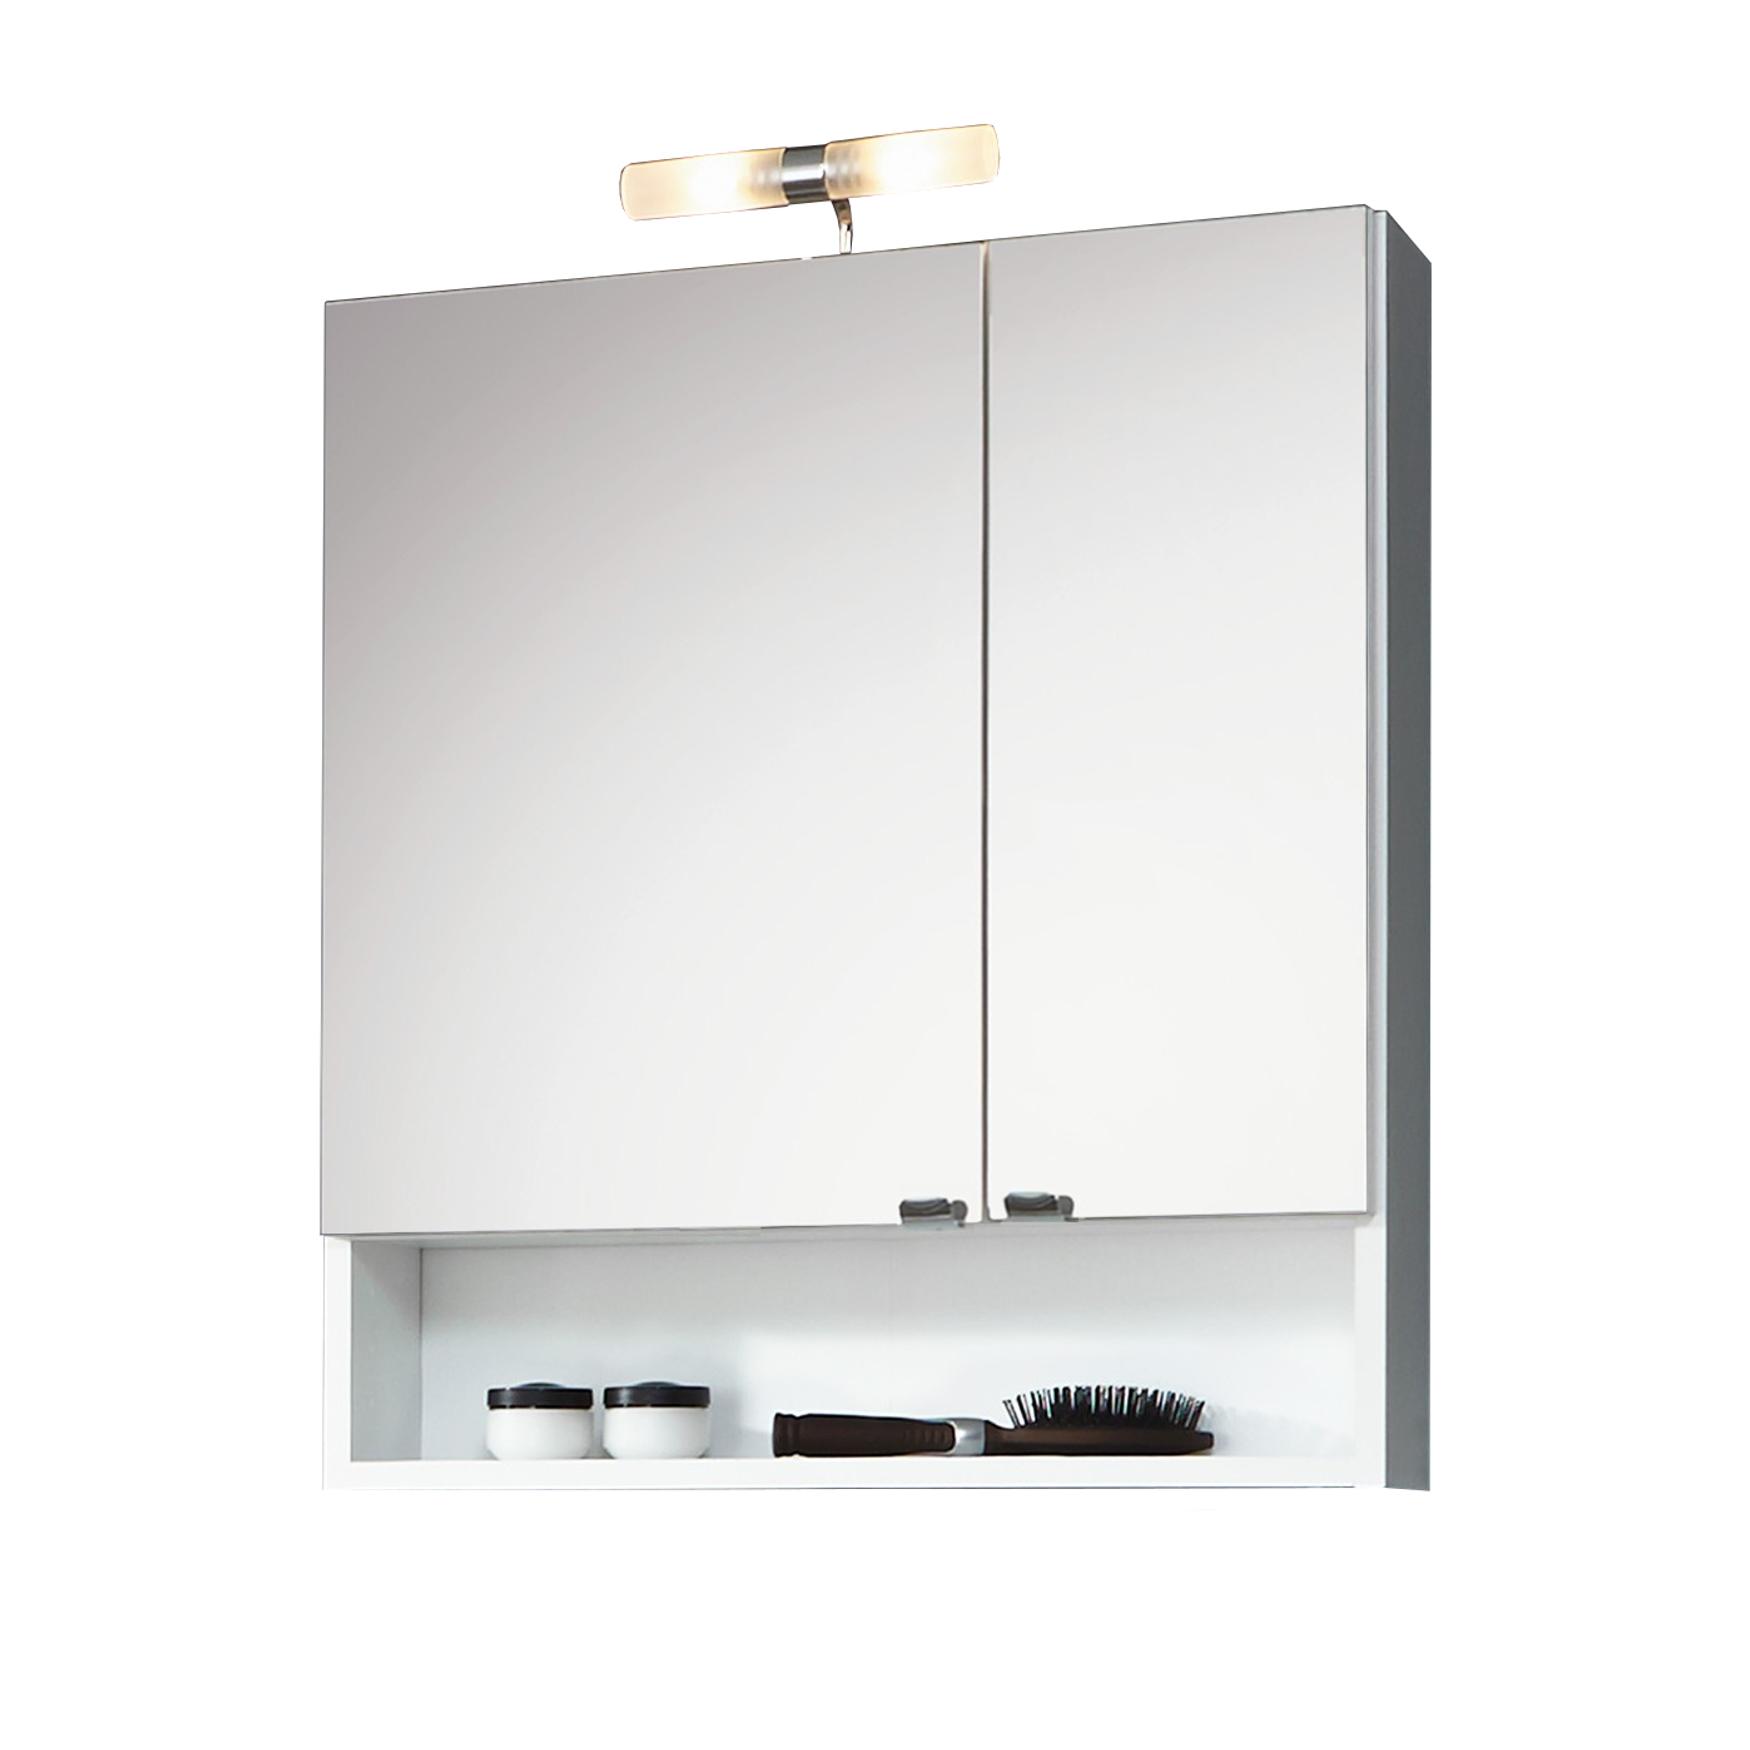 badm bel set nizza spiegelschrank mit fach 5 teilig. Black Bedroom Furniture Sets. Home Design Ideas